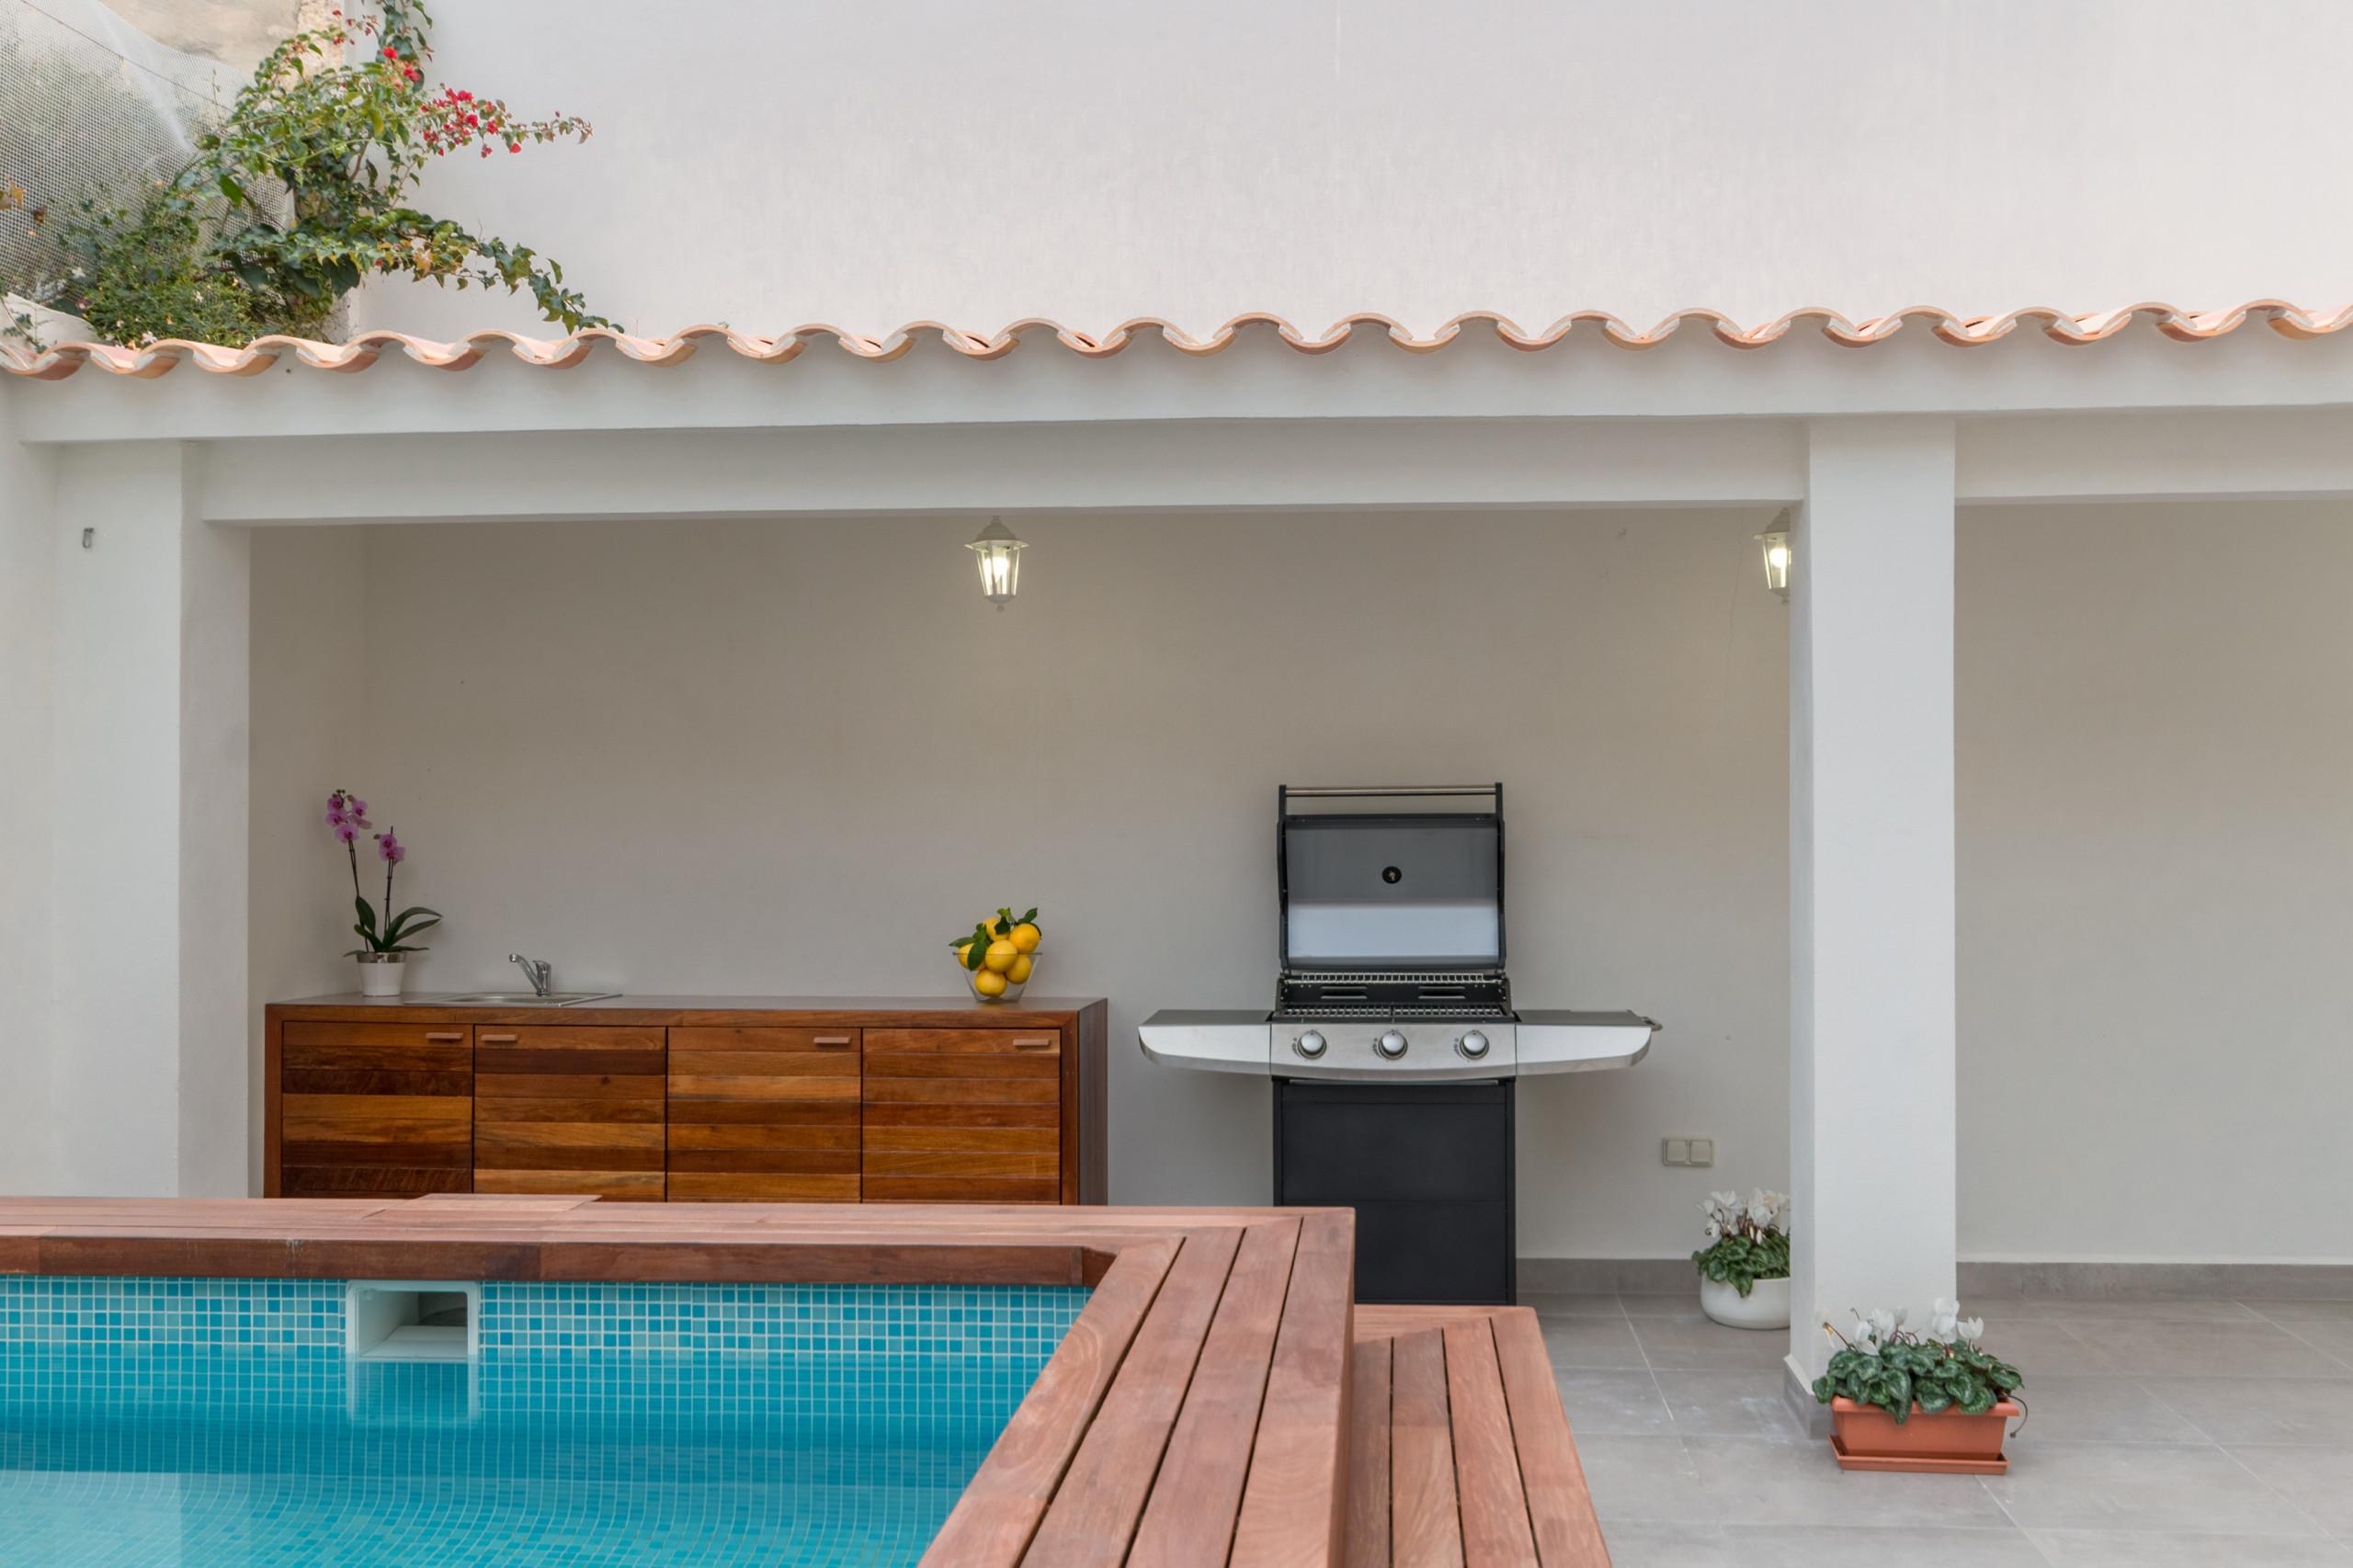 in Palma de Mallorca - Miquel Santandreu 40, TownHouse 5StarsHome Mallorc